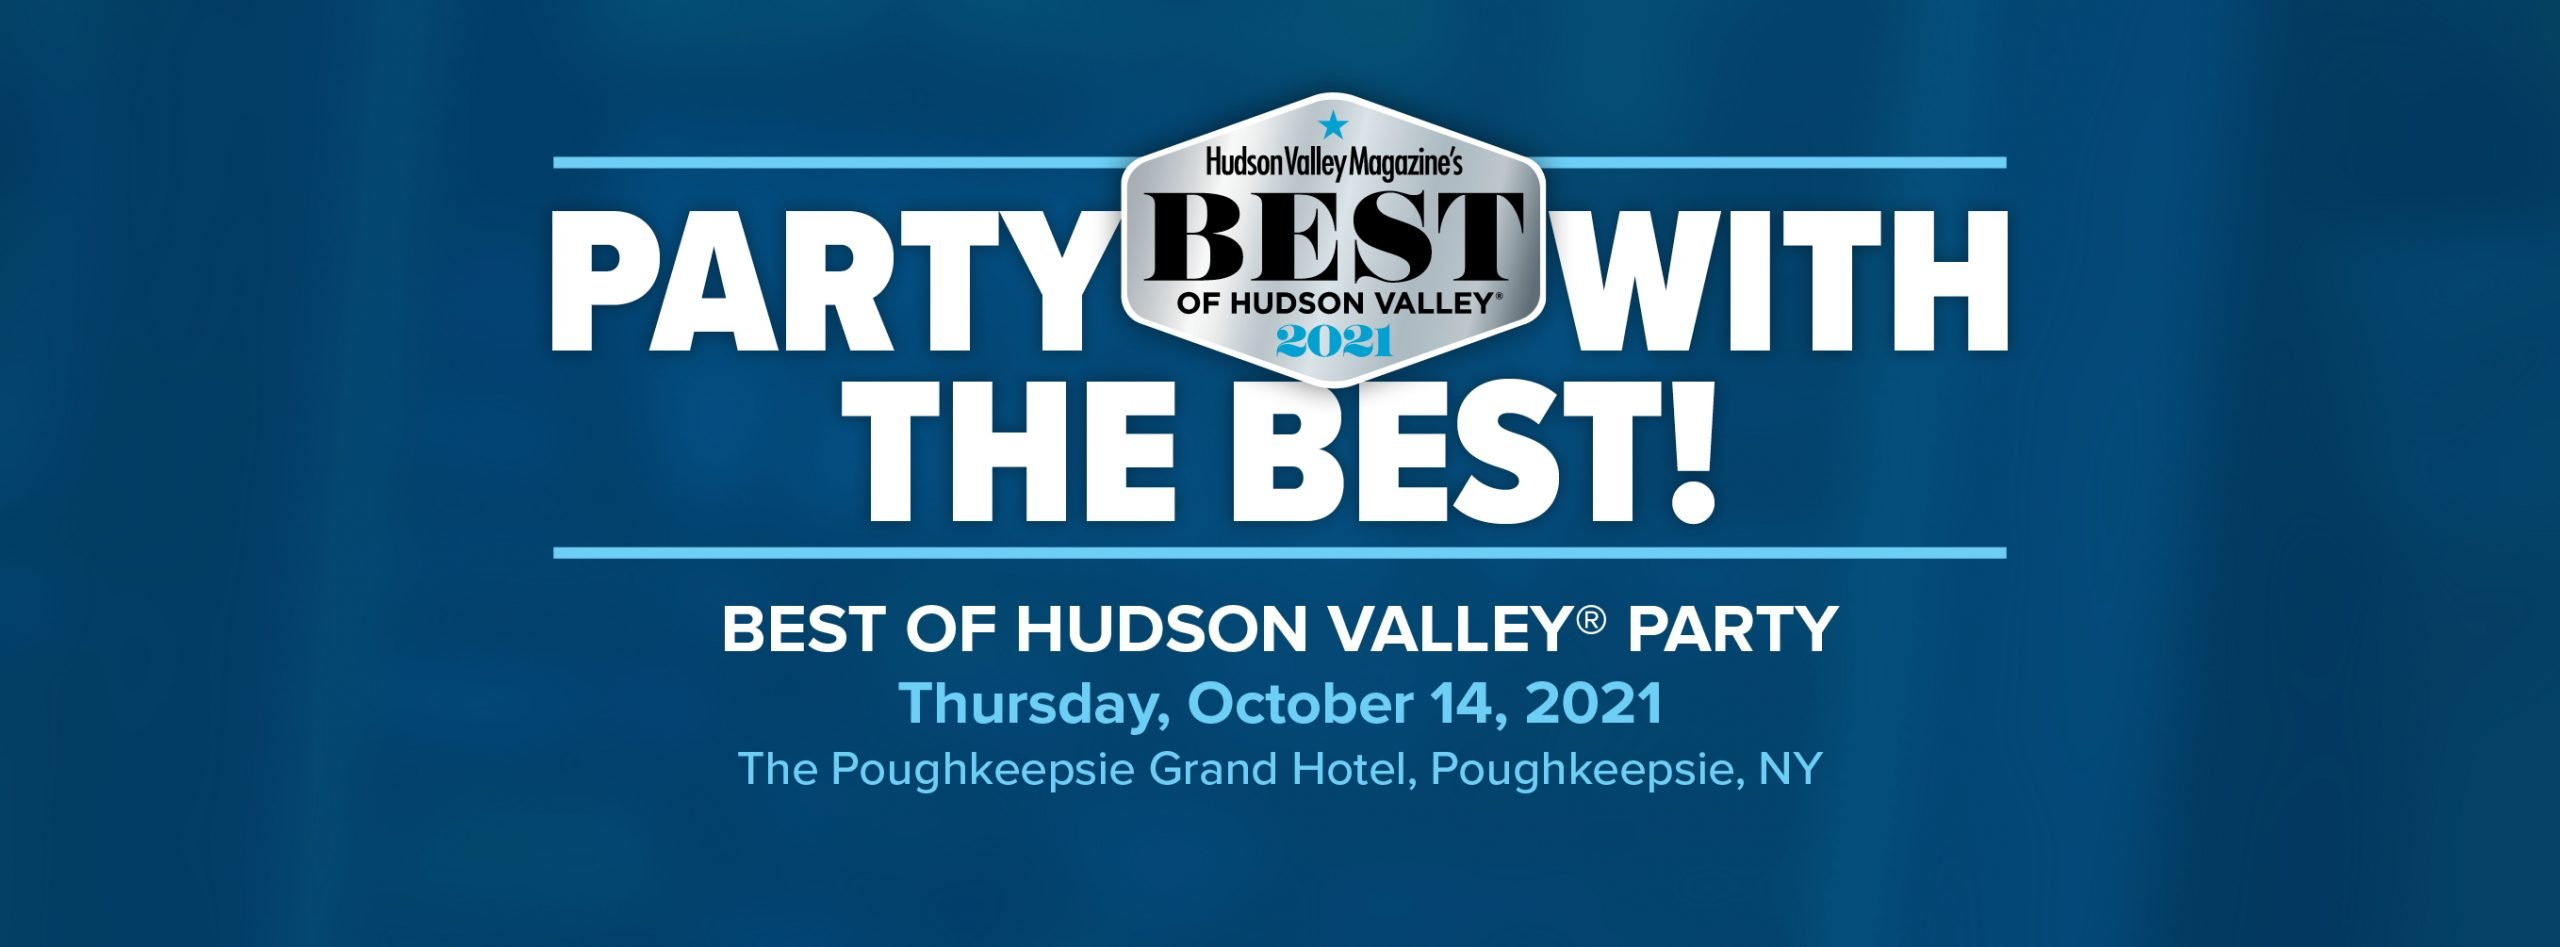 Best of Hudson Valley Graphic